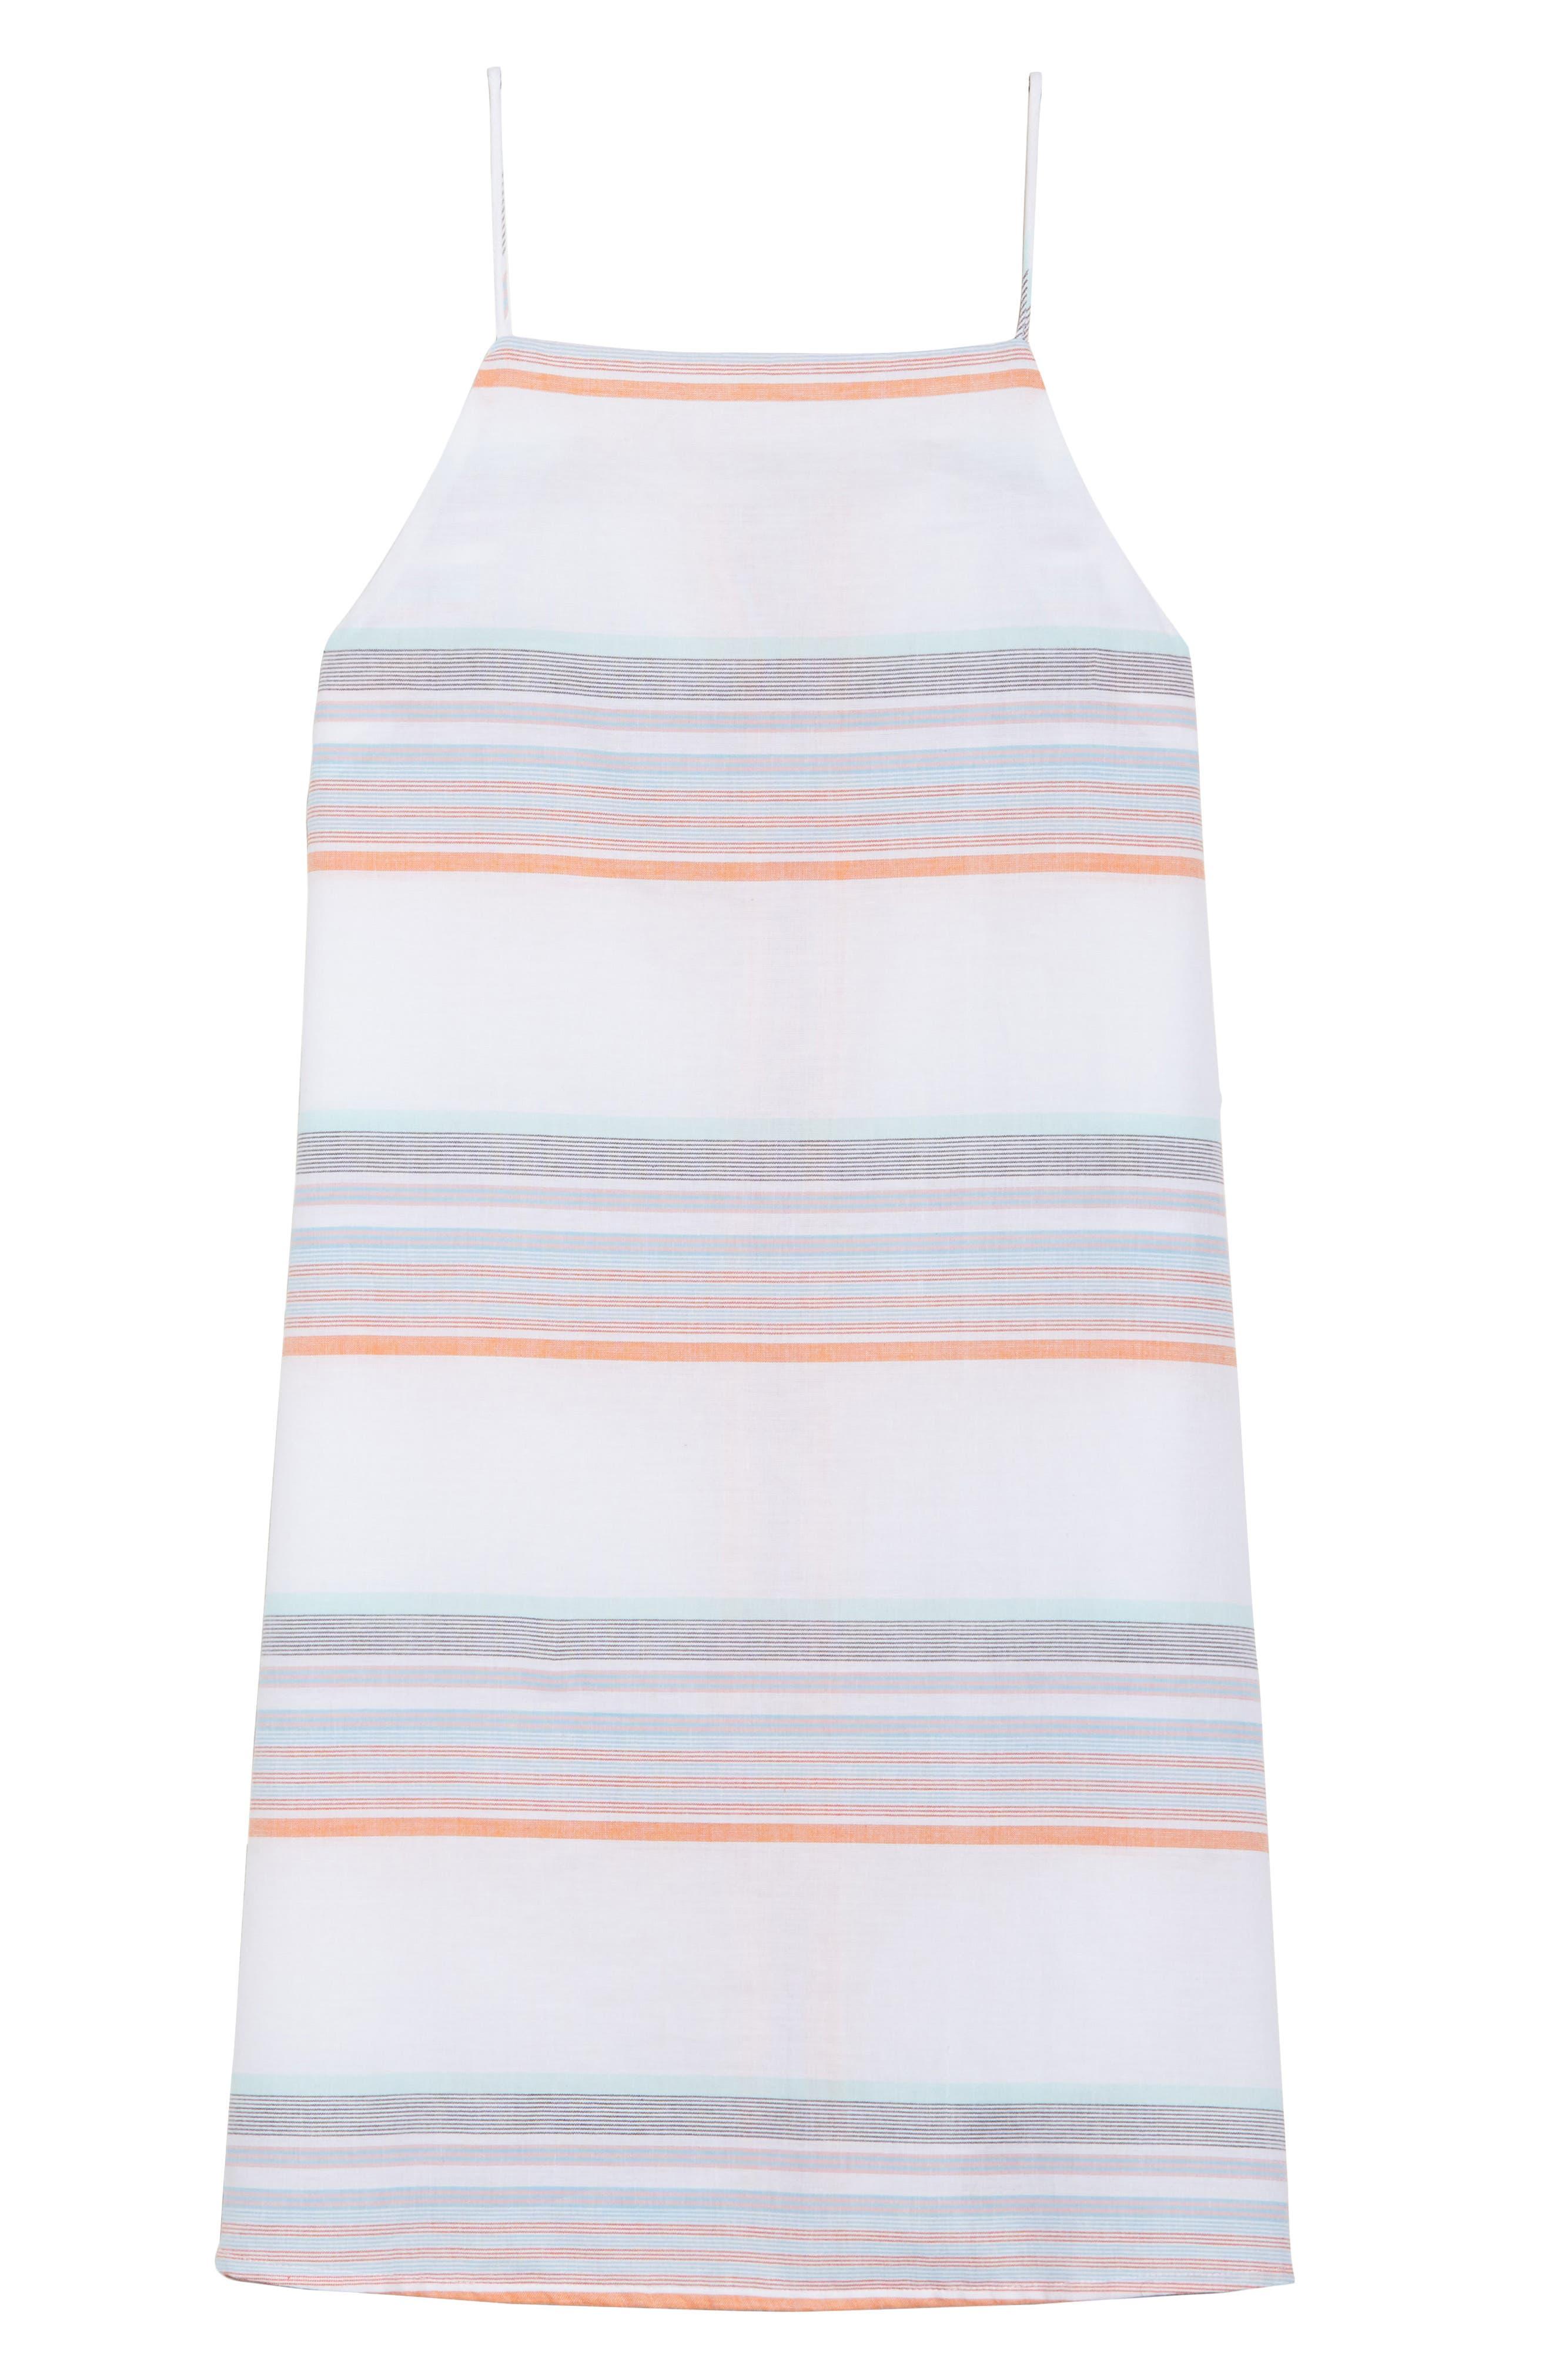 Sunset Stripe Cover-Up Dress,                             Alternate thumbnail 6, color,                             100